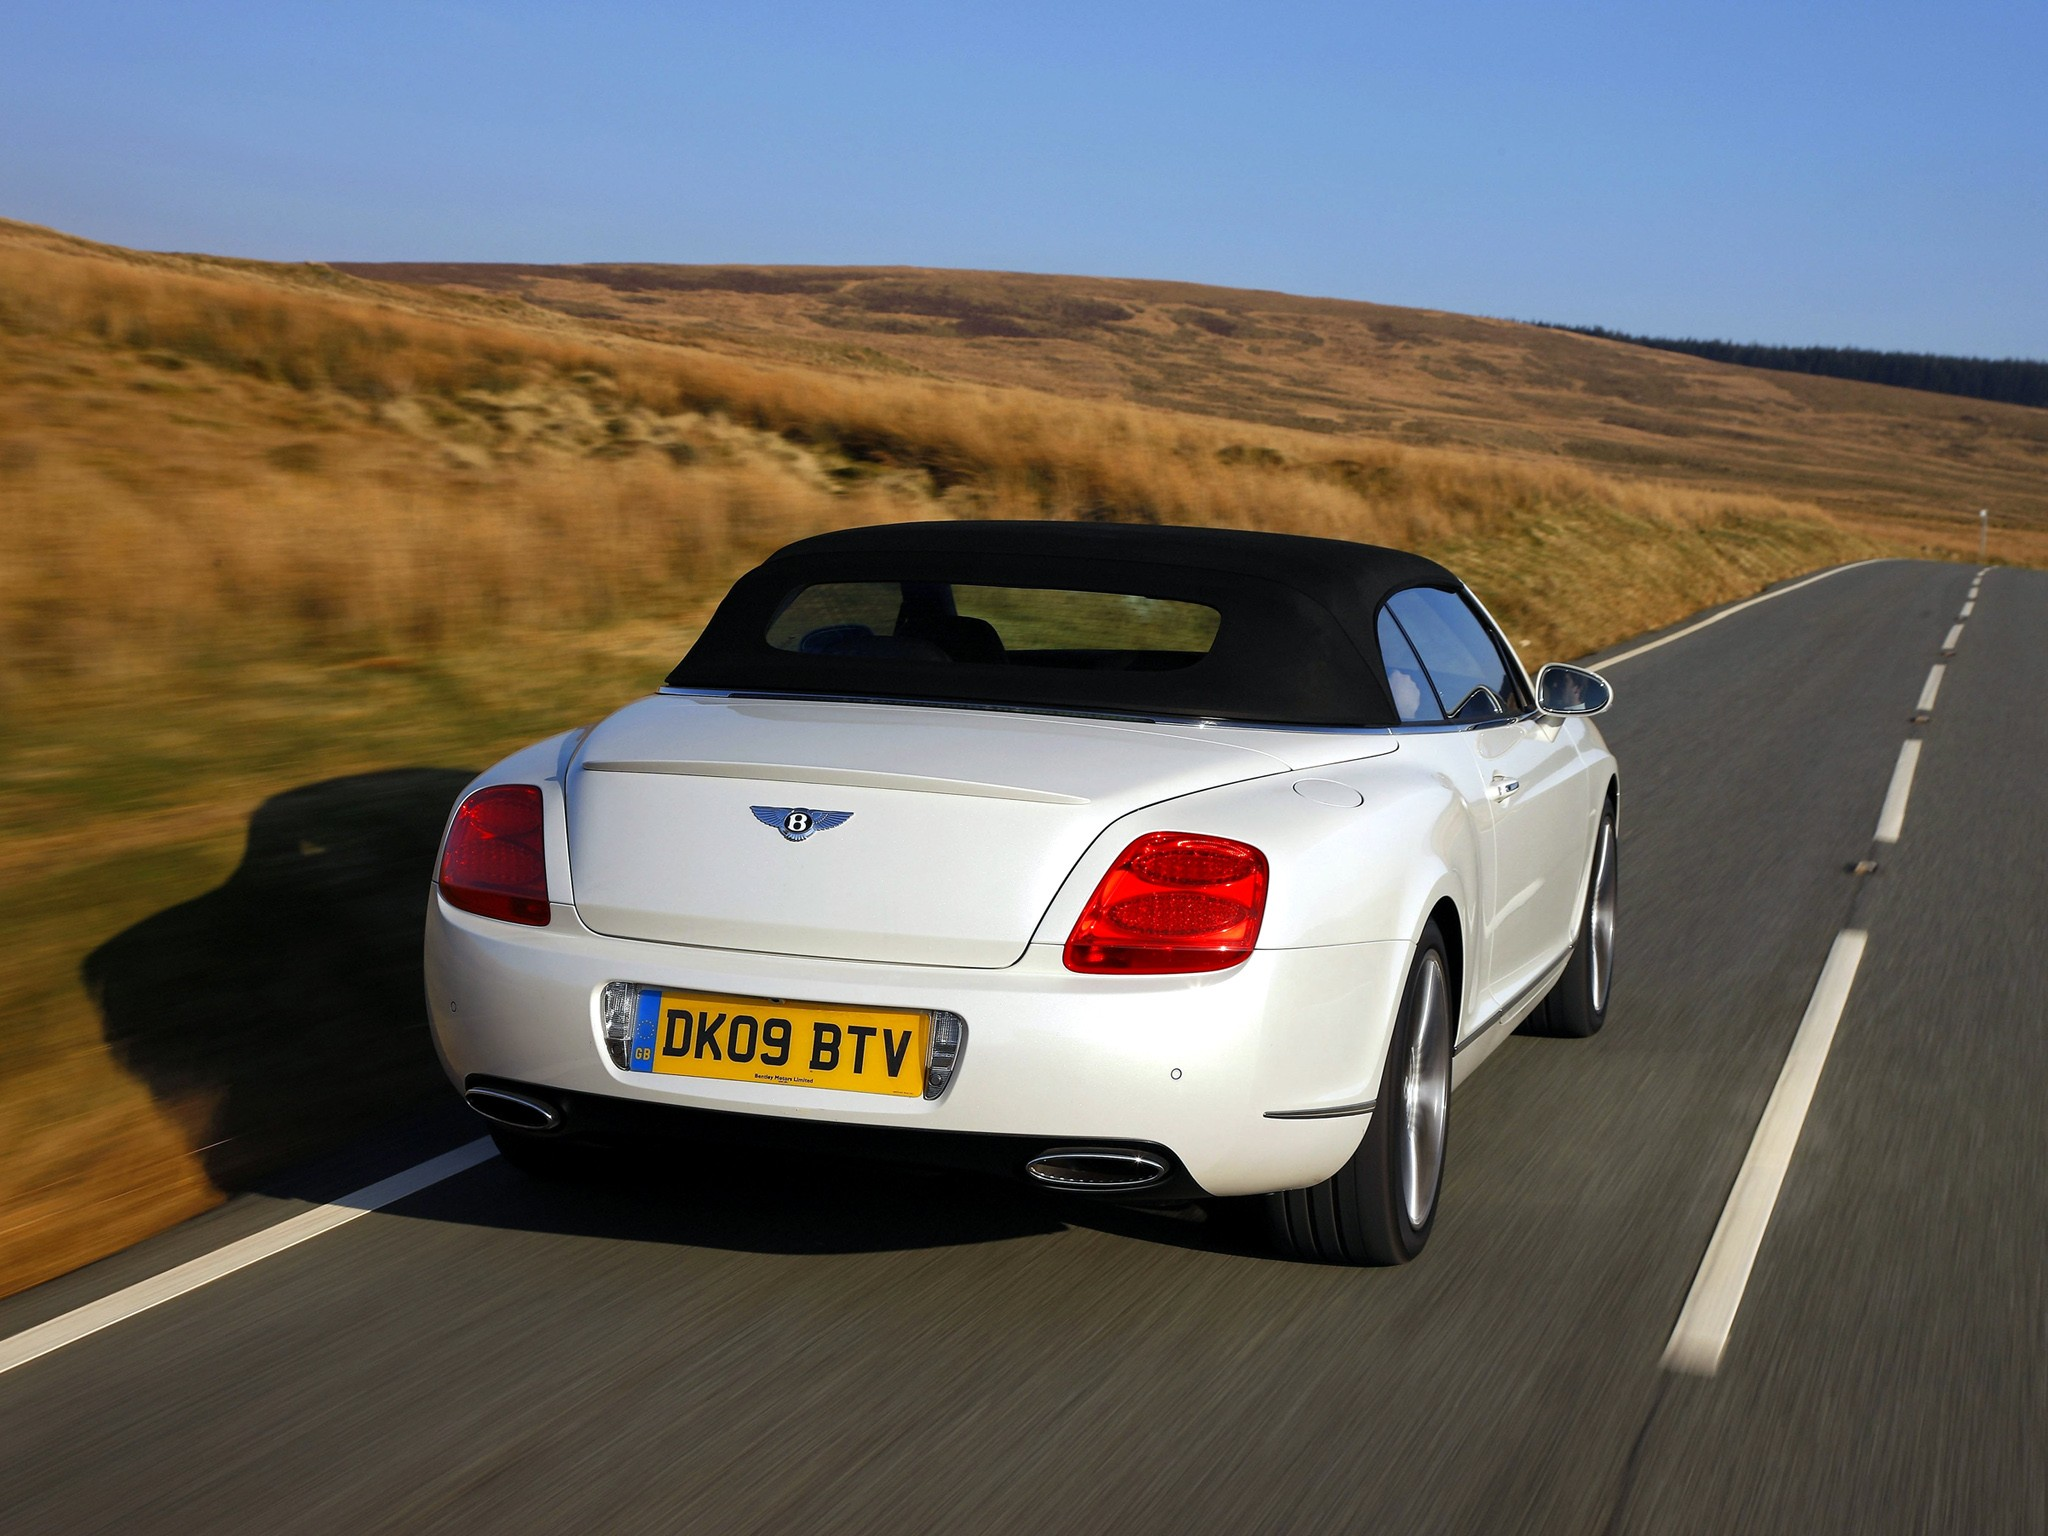 Bentley continental gtc speed specs 2009 2010 2011 2012 2013 bentley continental gtc speed 2009 2013 vanachro Image collections